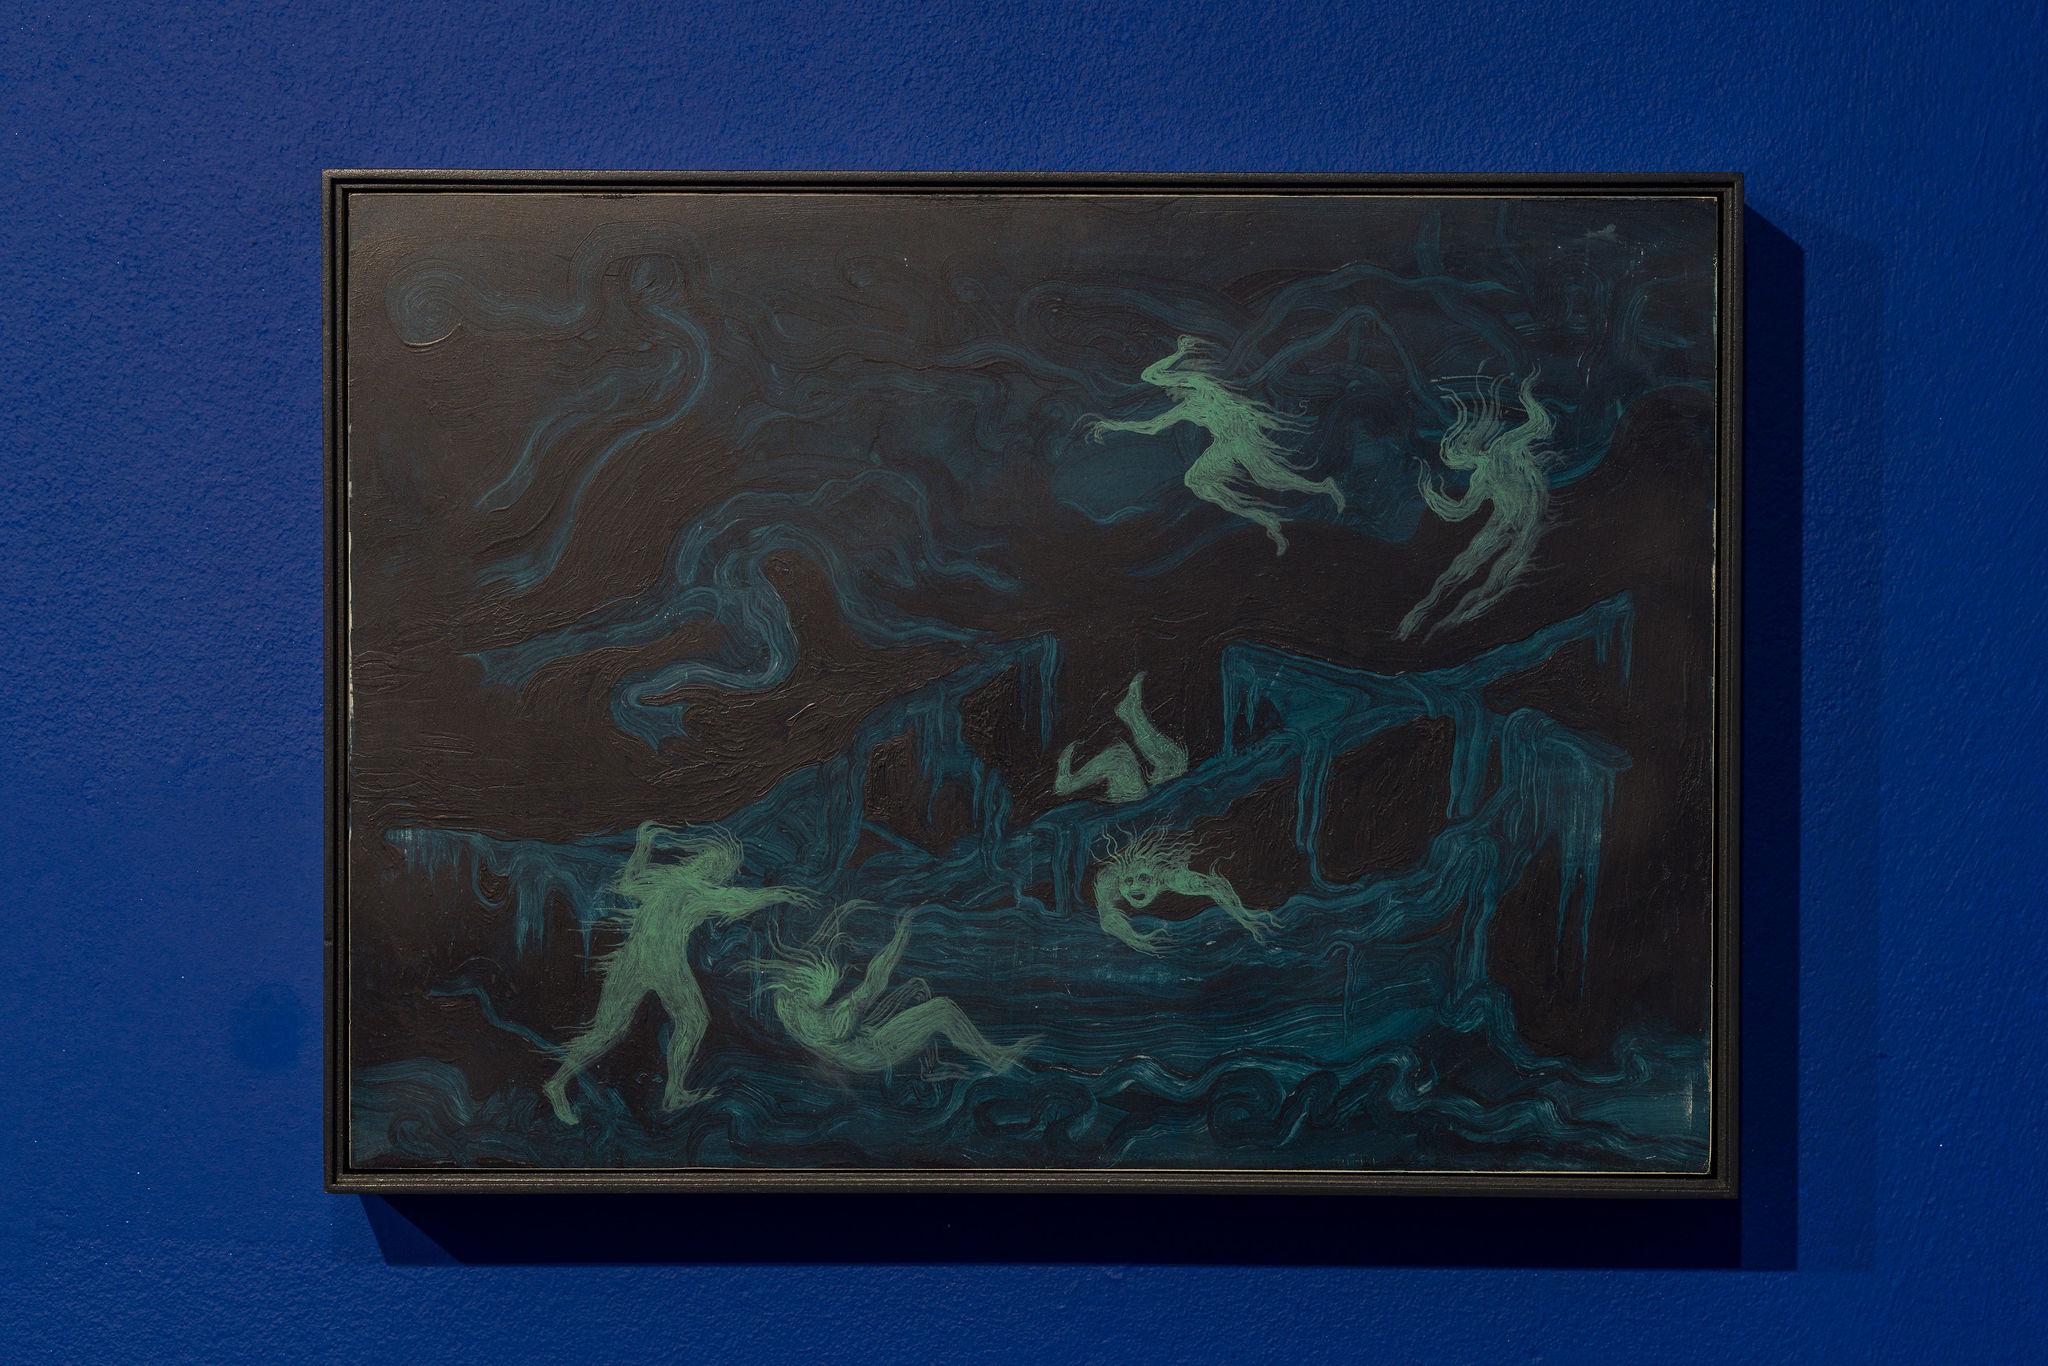 Hortensia Mi Kafchin, Danube Ghosts, 2021, Oil on wood